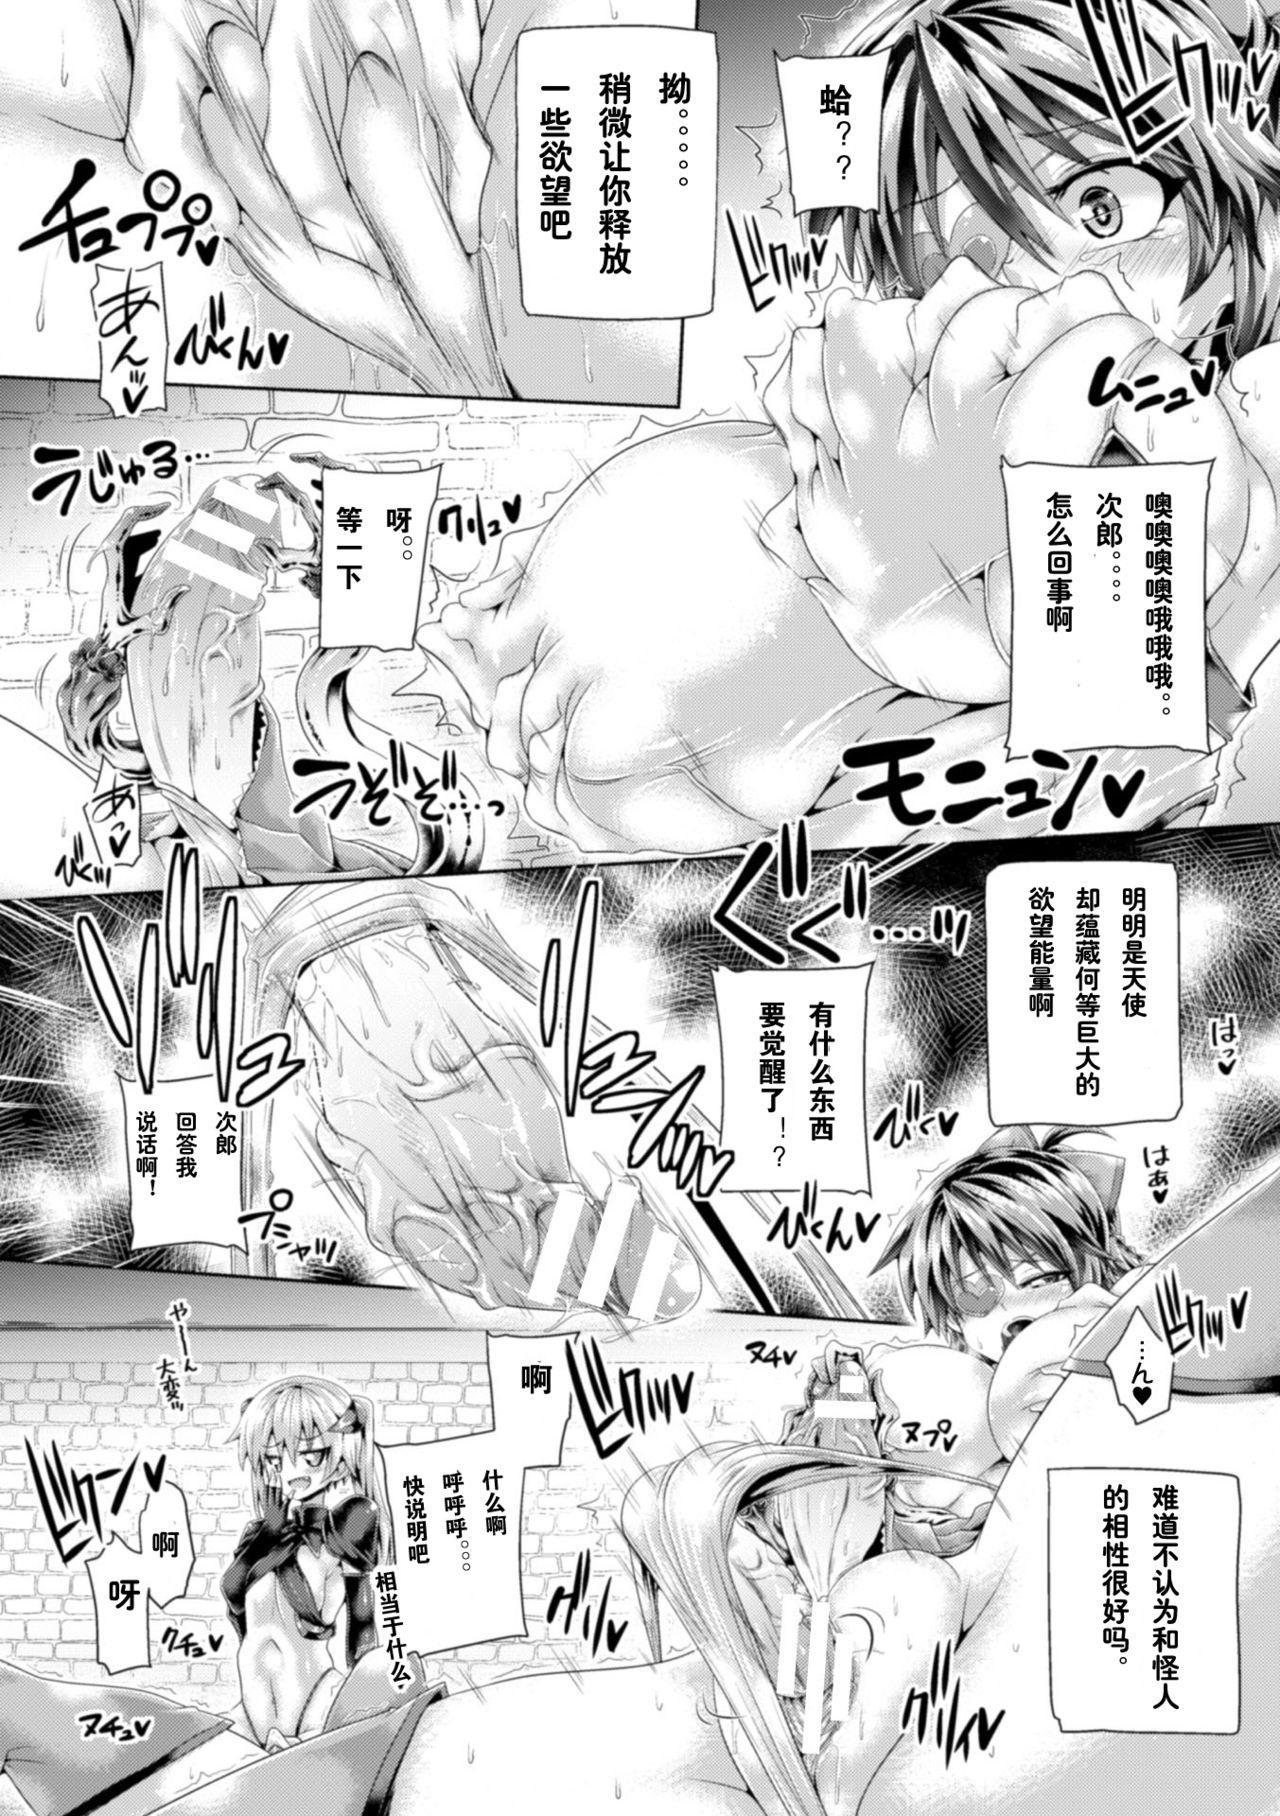 2D Comic Magazine Tenshi ni Ochiru Akuma-tachi Vol. 1 35